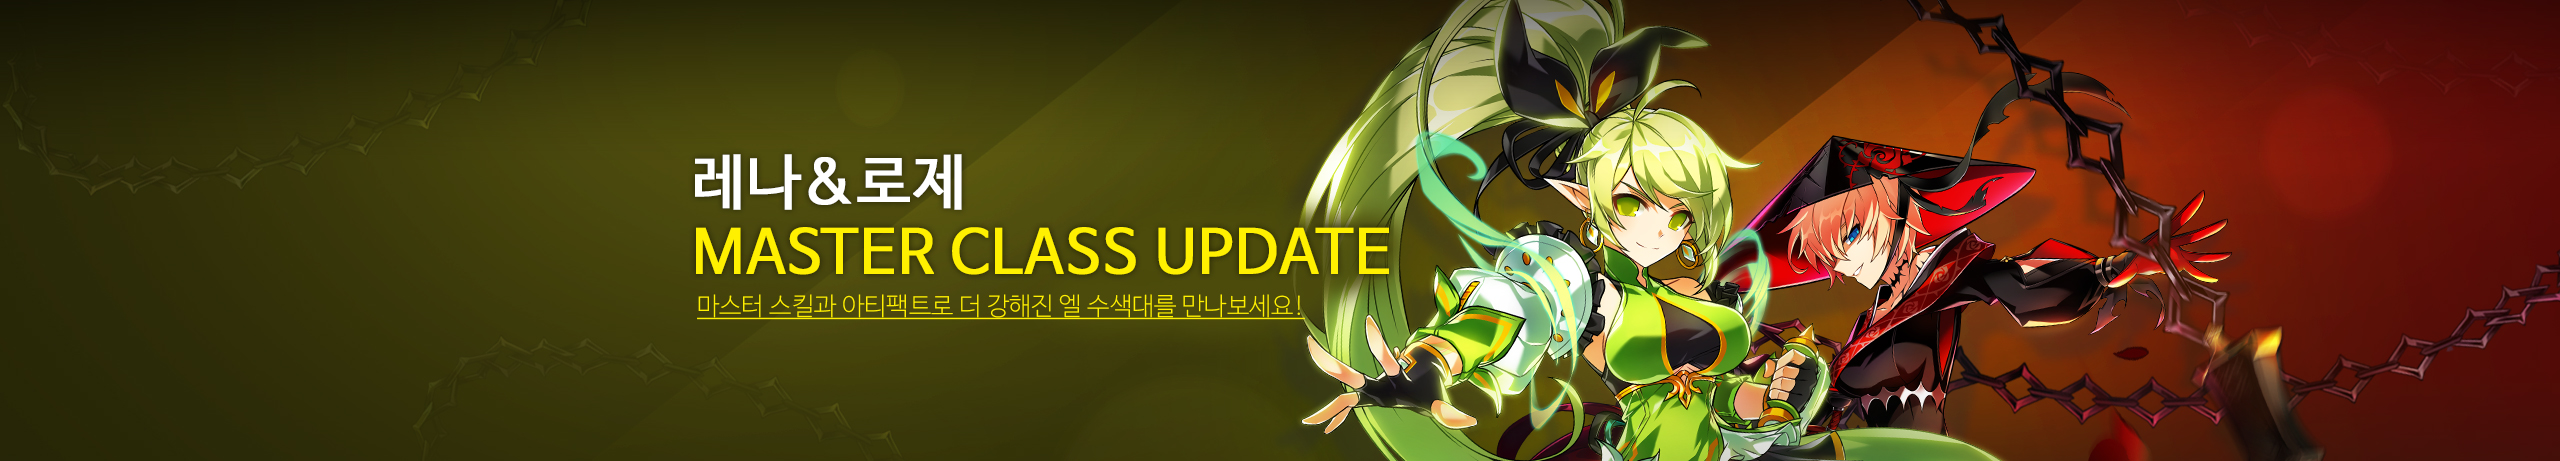 MASTER CLASS UPDATE - 3차